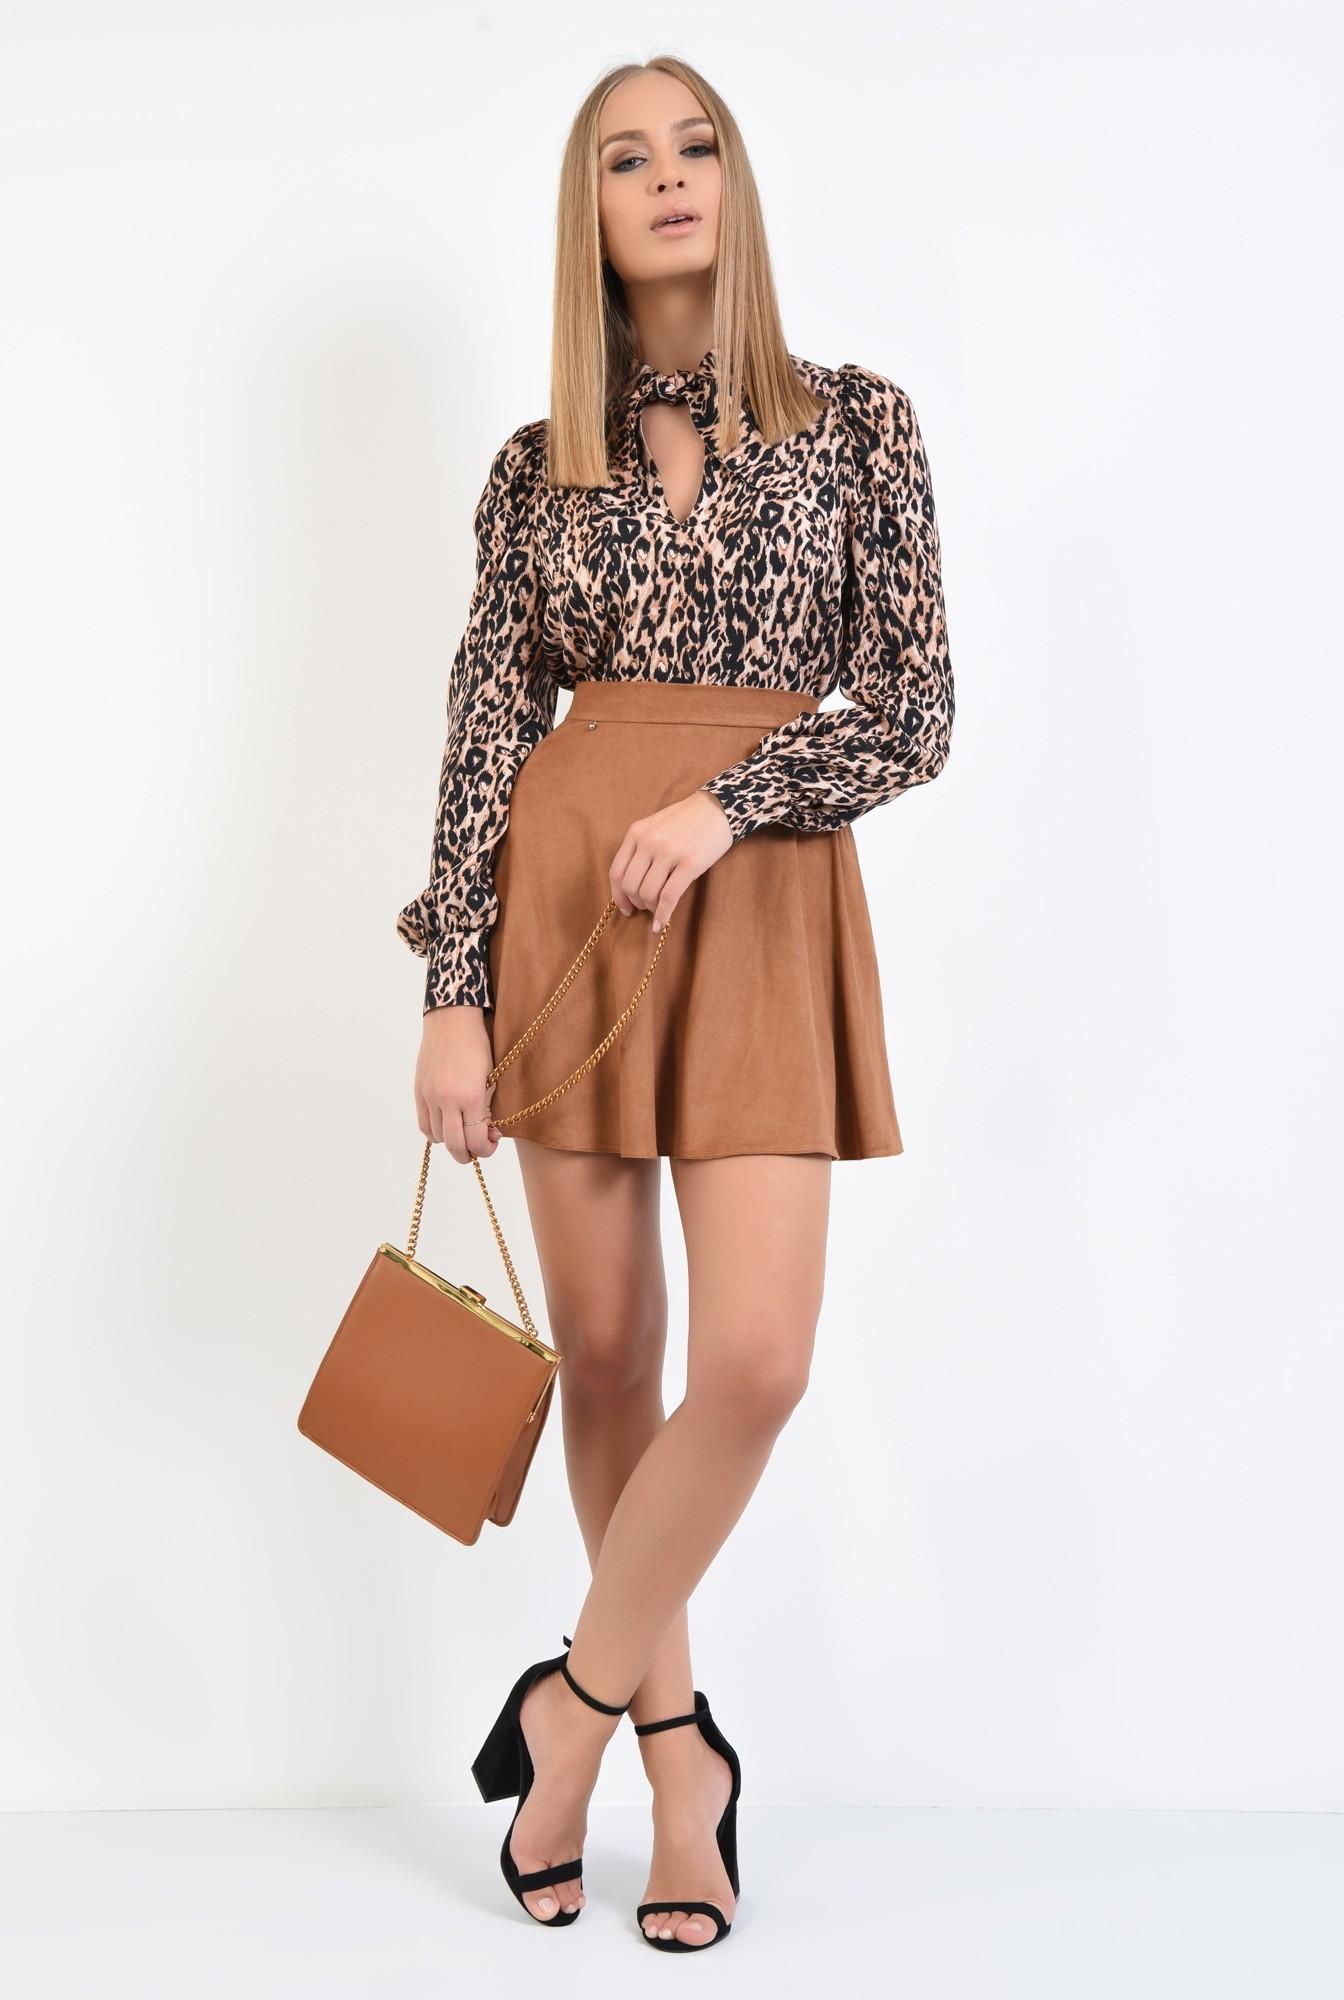 3 - bluza animal print, leopard, imprimeu, maneci lungi